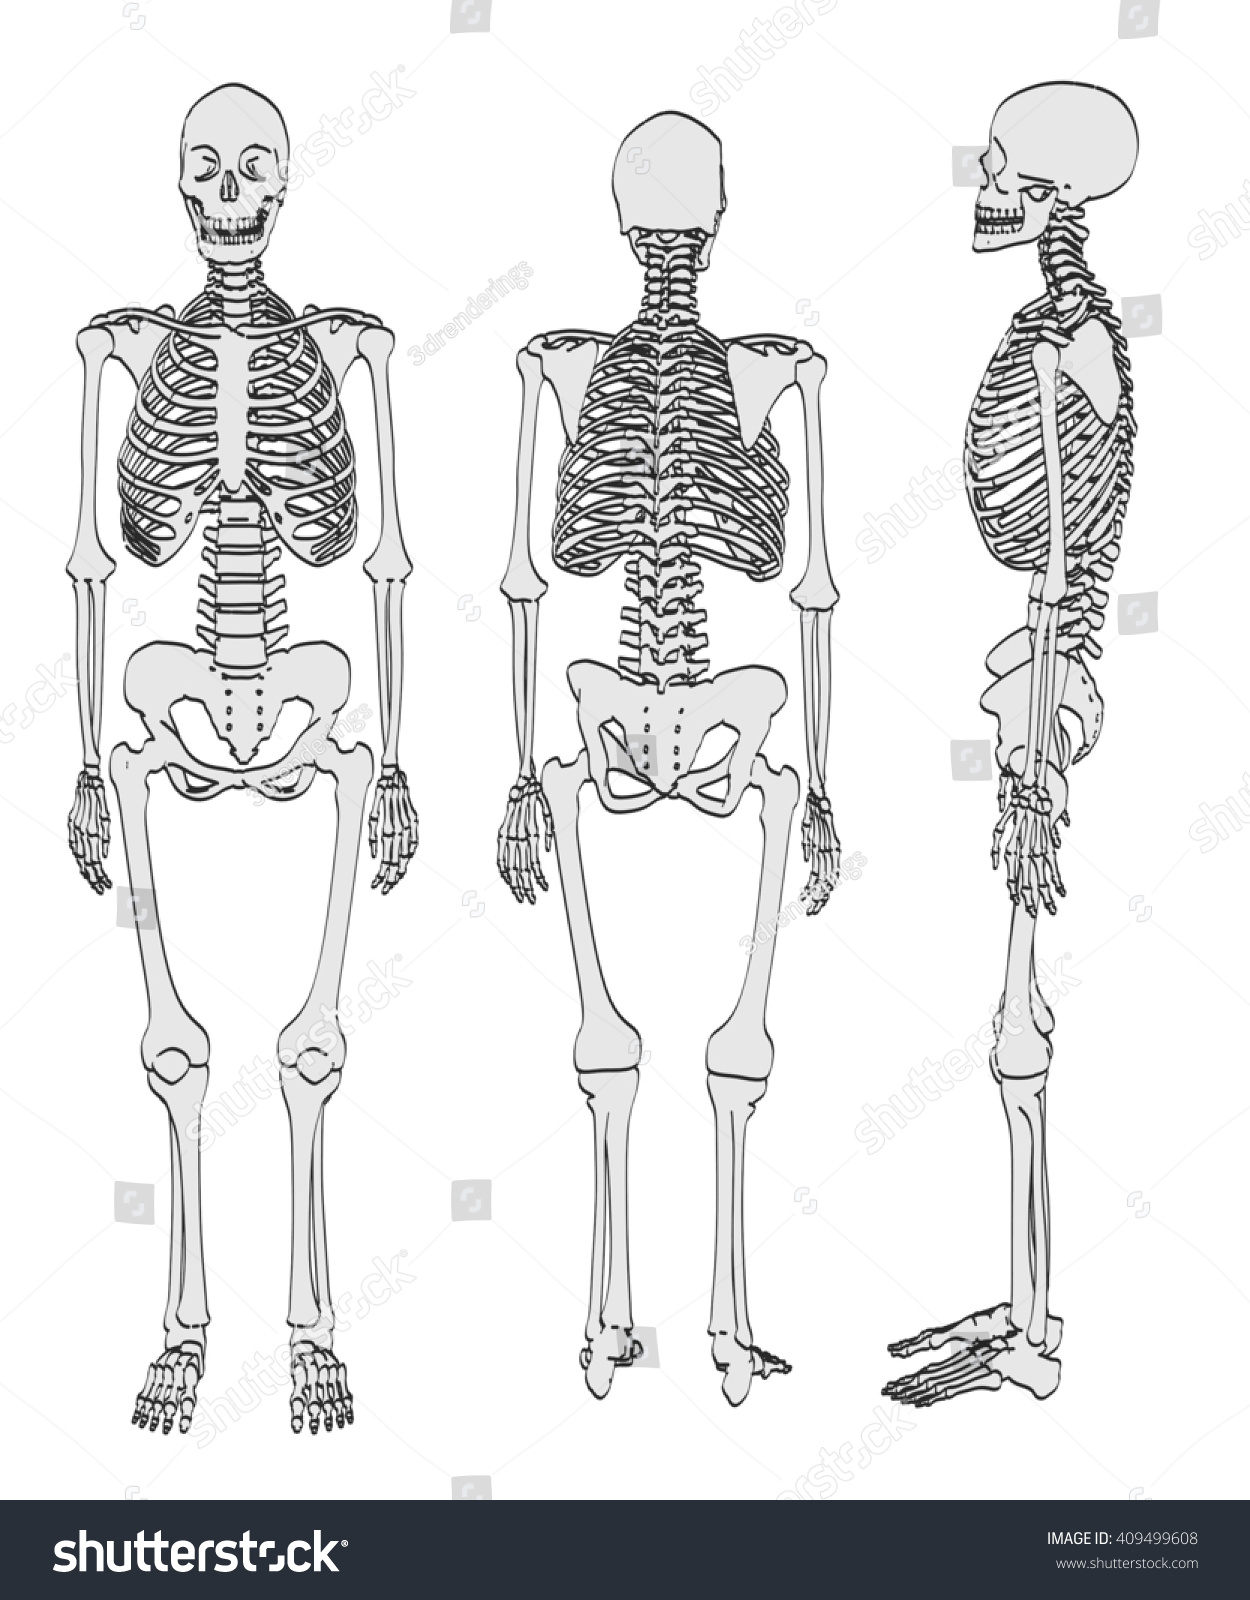 2 D Cartoon Illustration Female Skeleton Stock Illustration ...